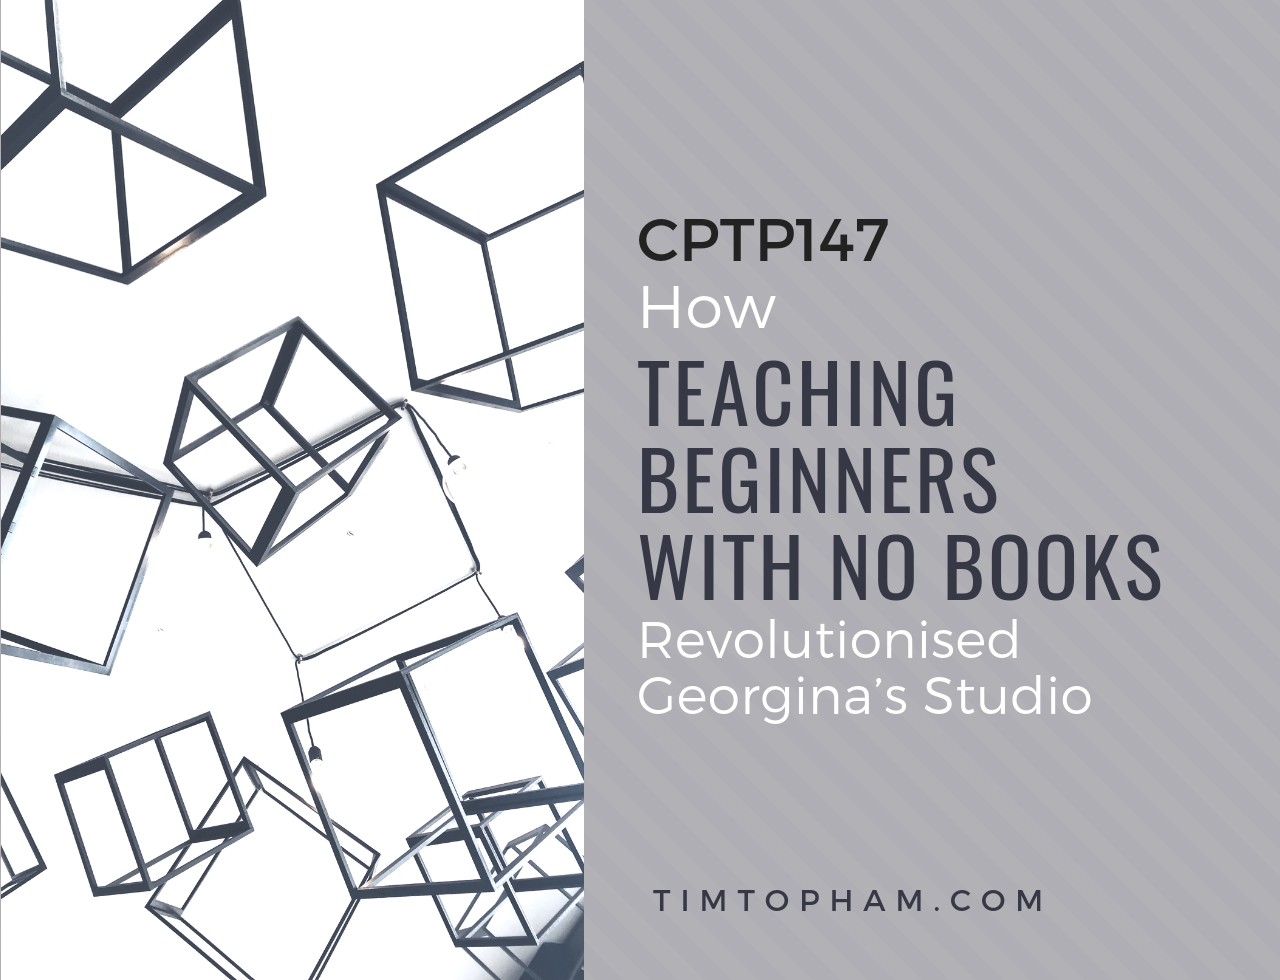 Teaching Beginners